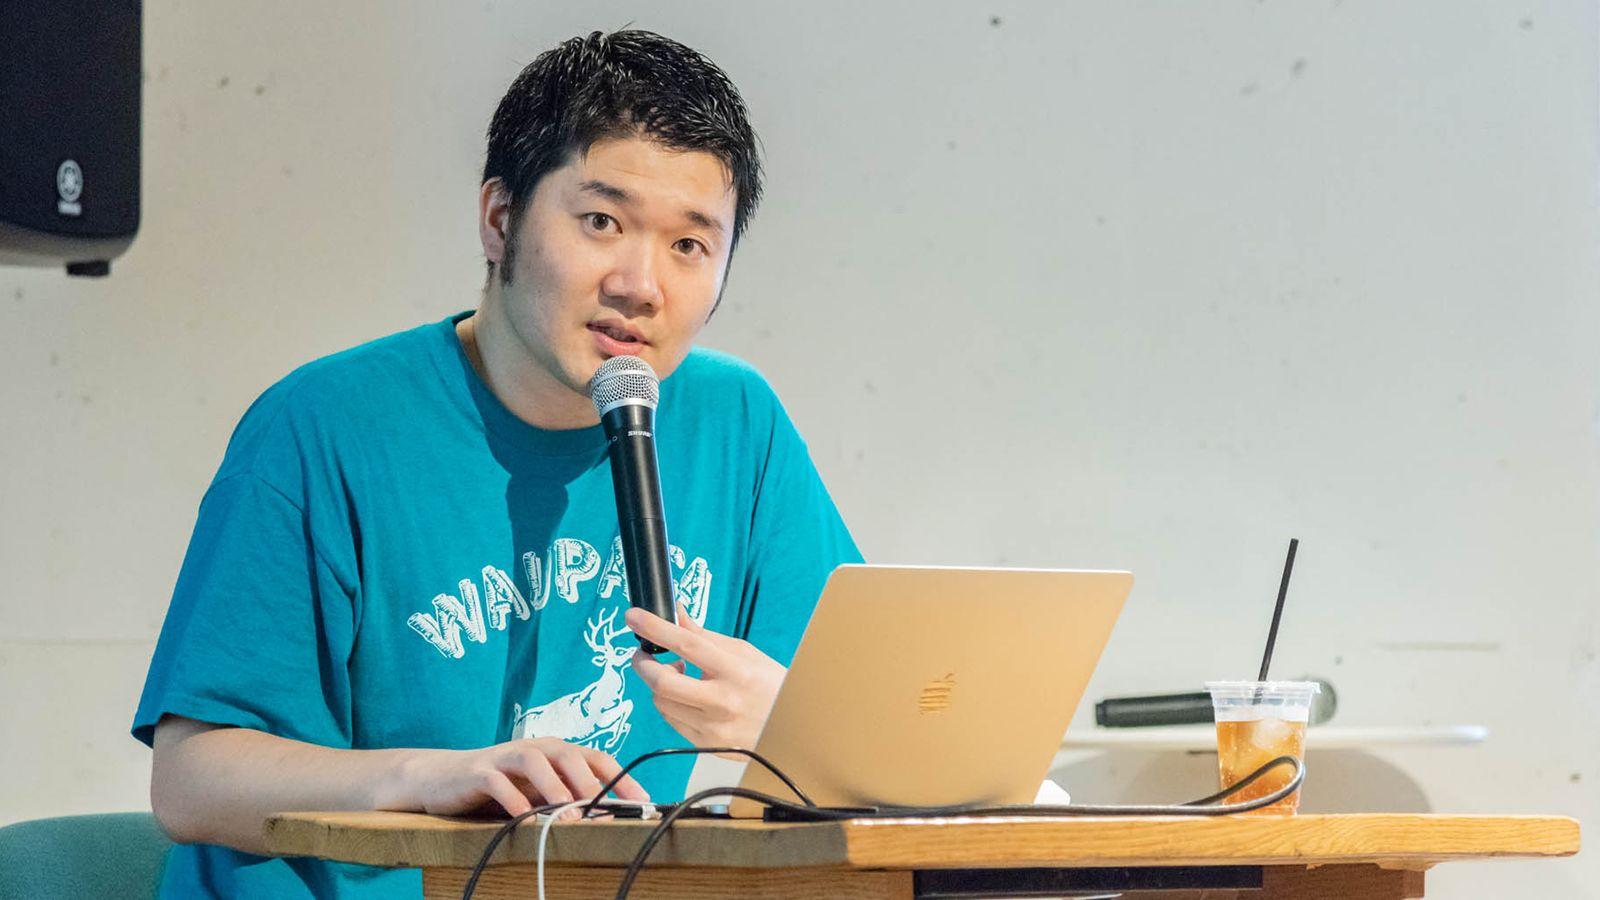 noteを書きたいけど、何をどう書けばいいかわからない君へ。コピーライター 阿部広太郎さんと考える、書くことの楽しみ方